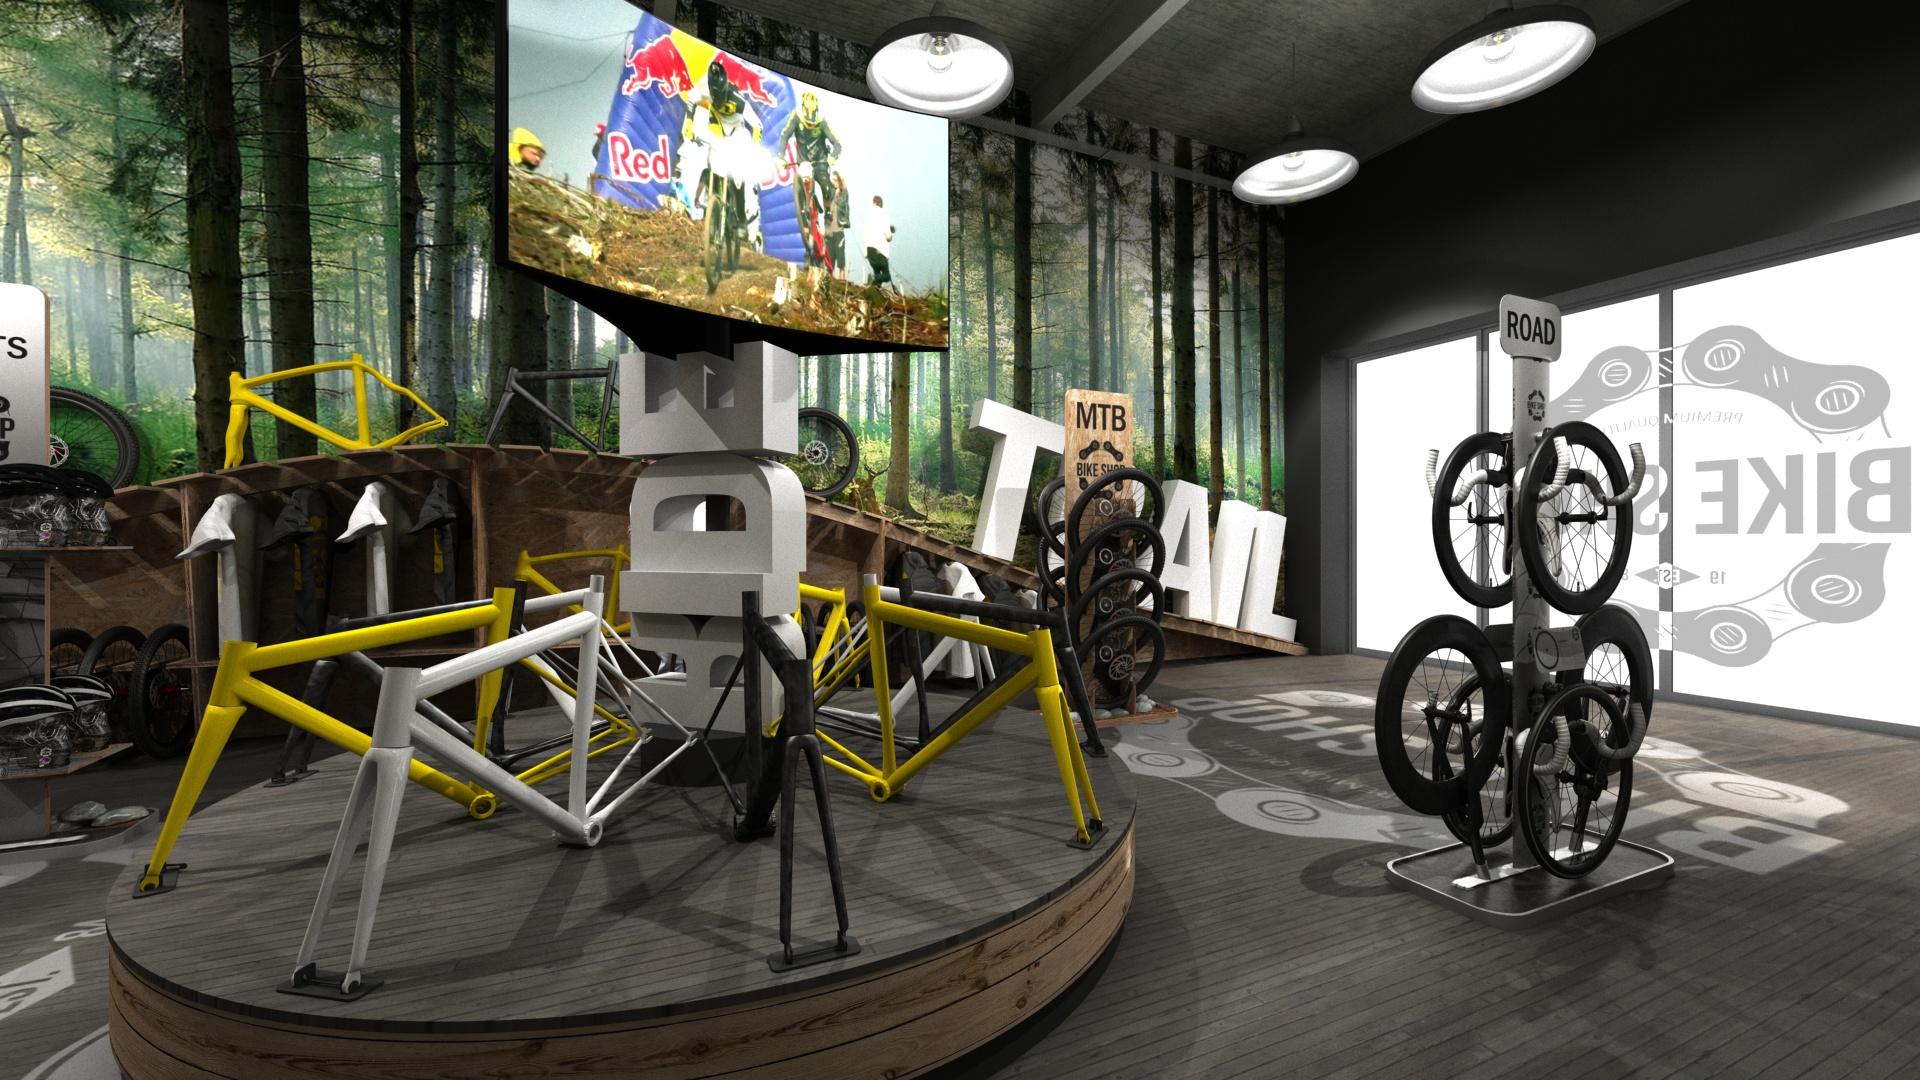 Retail Cycle Store 0008.jpg